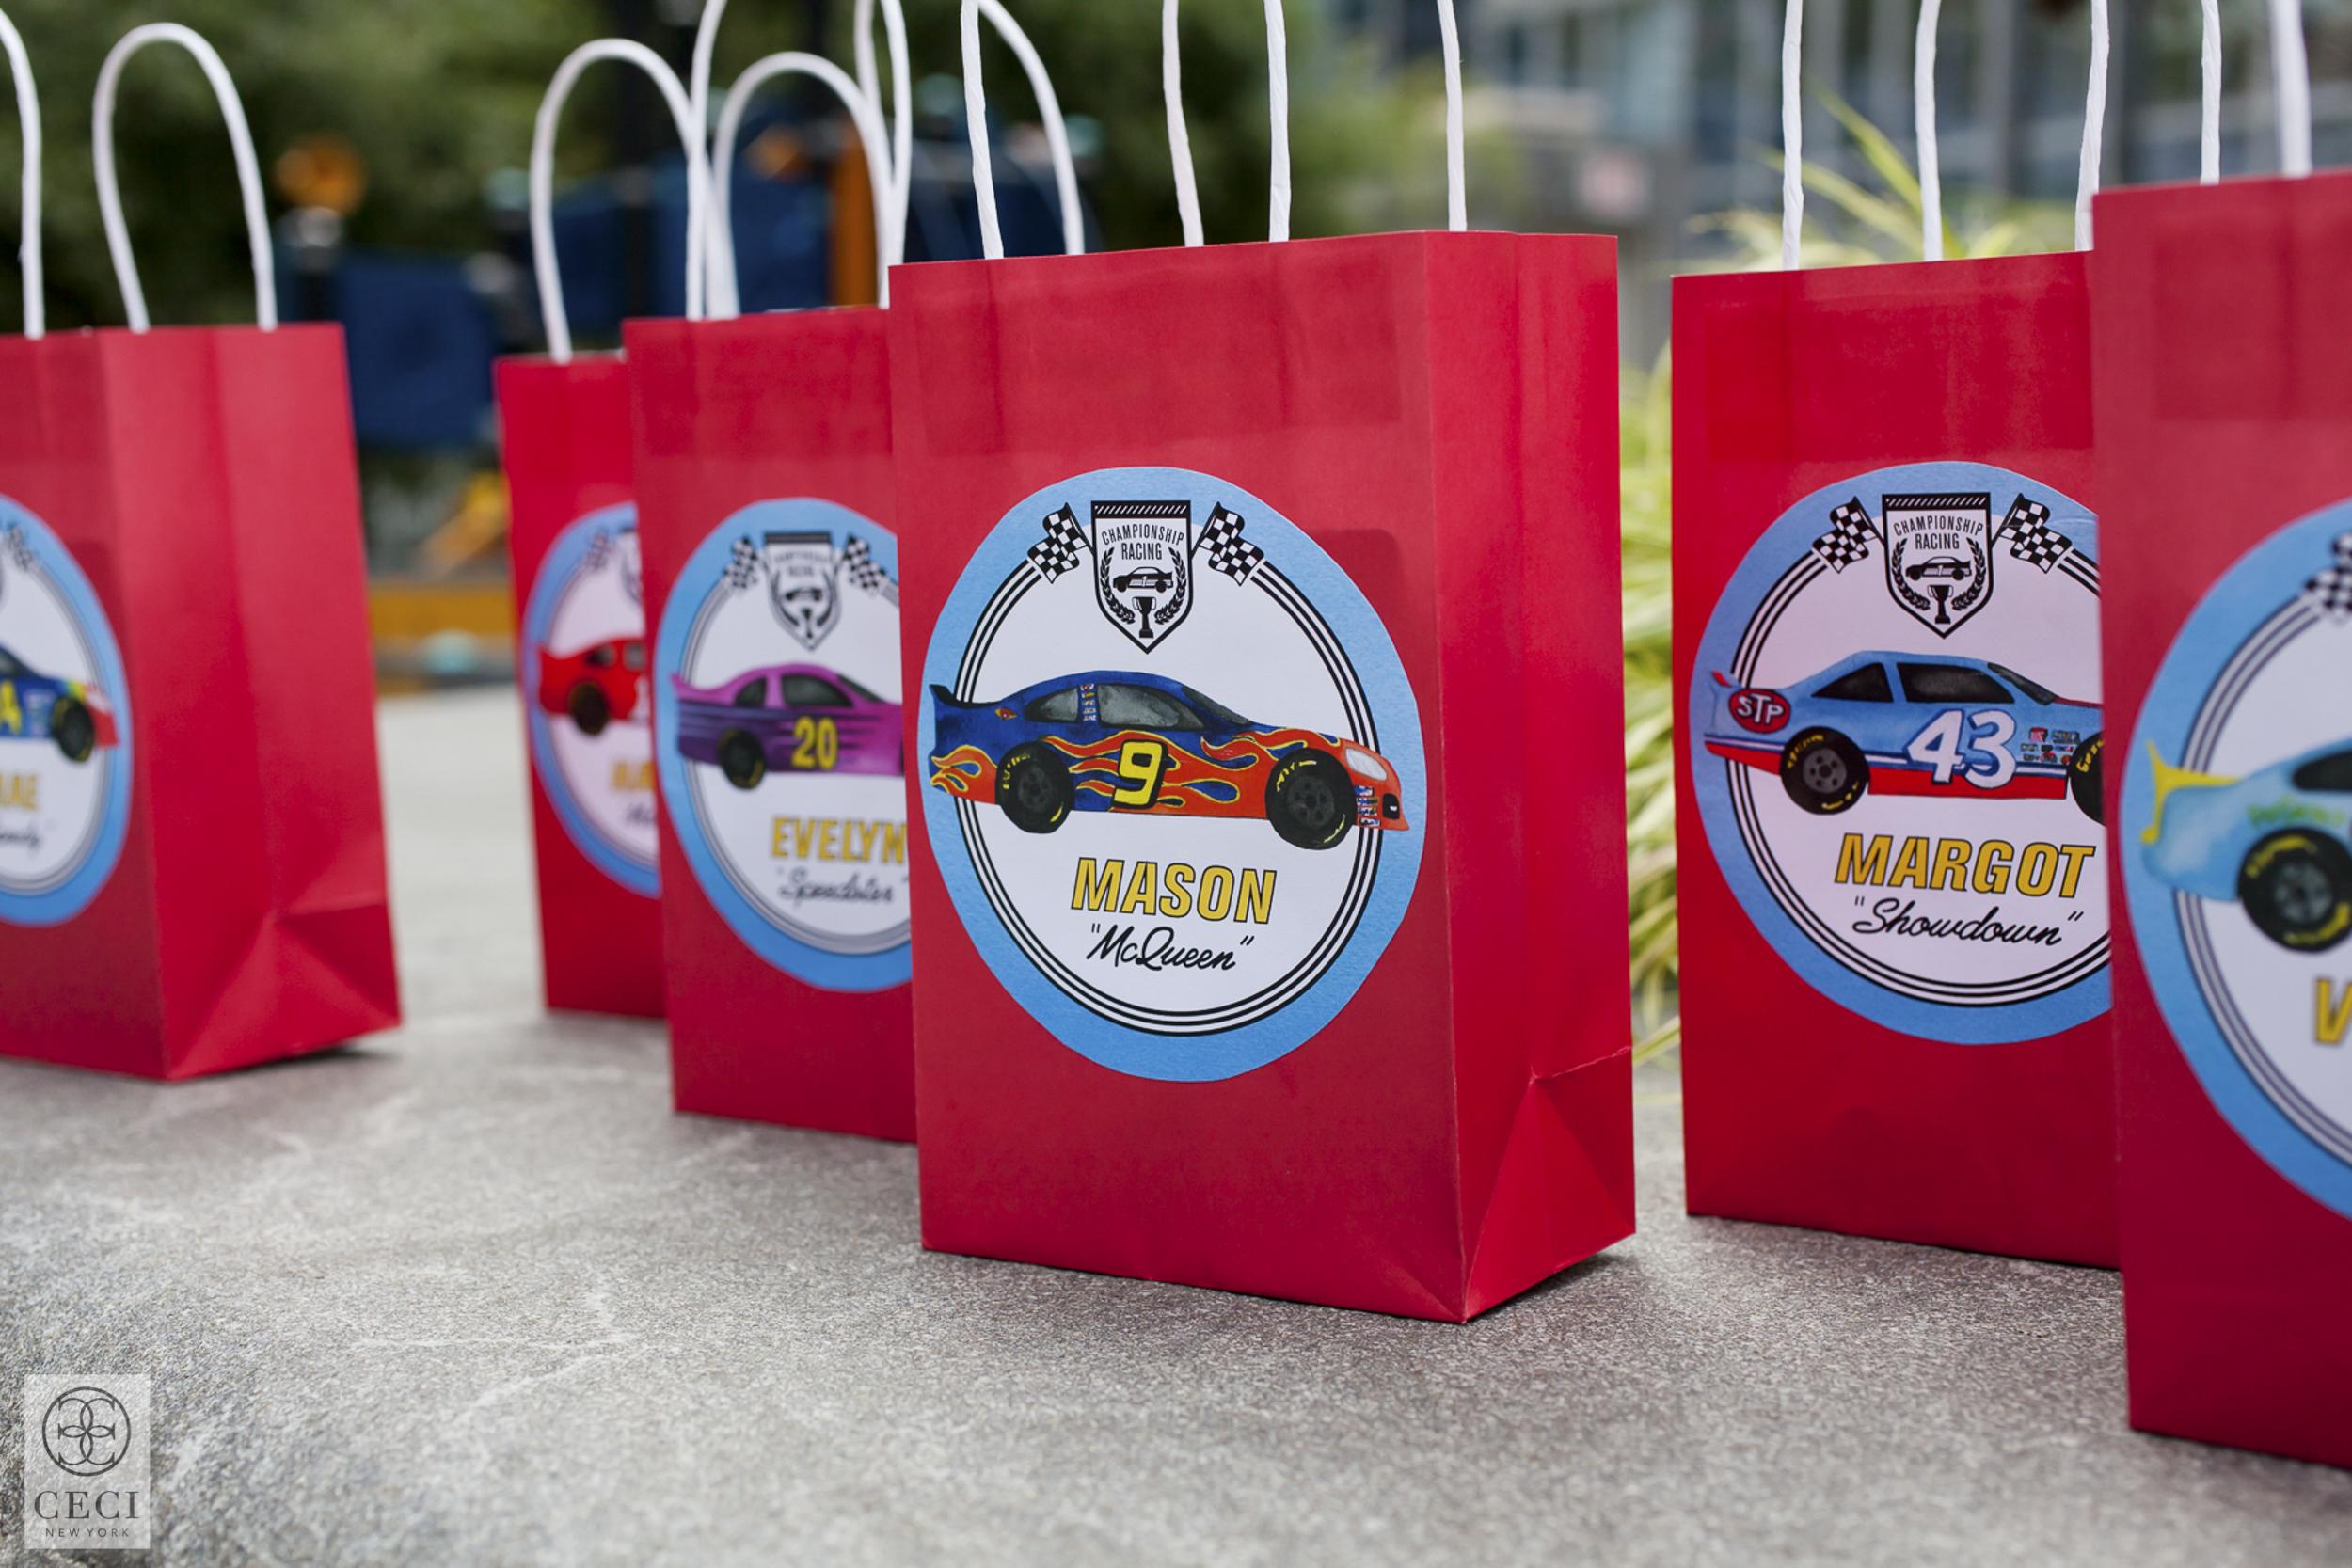 ceci_new_york_mason_ceci_johnson_race_car_birthday_party-2.jpg